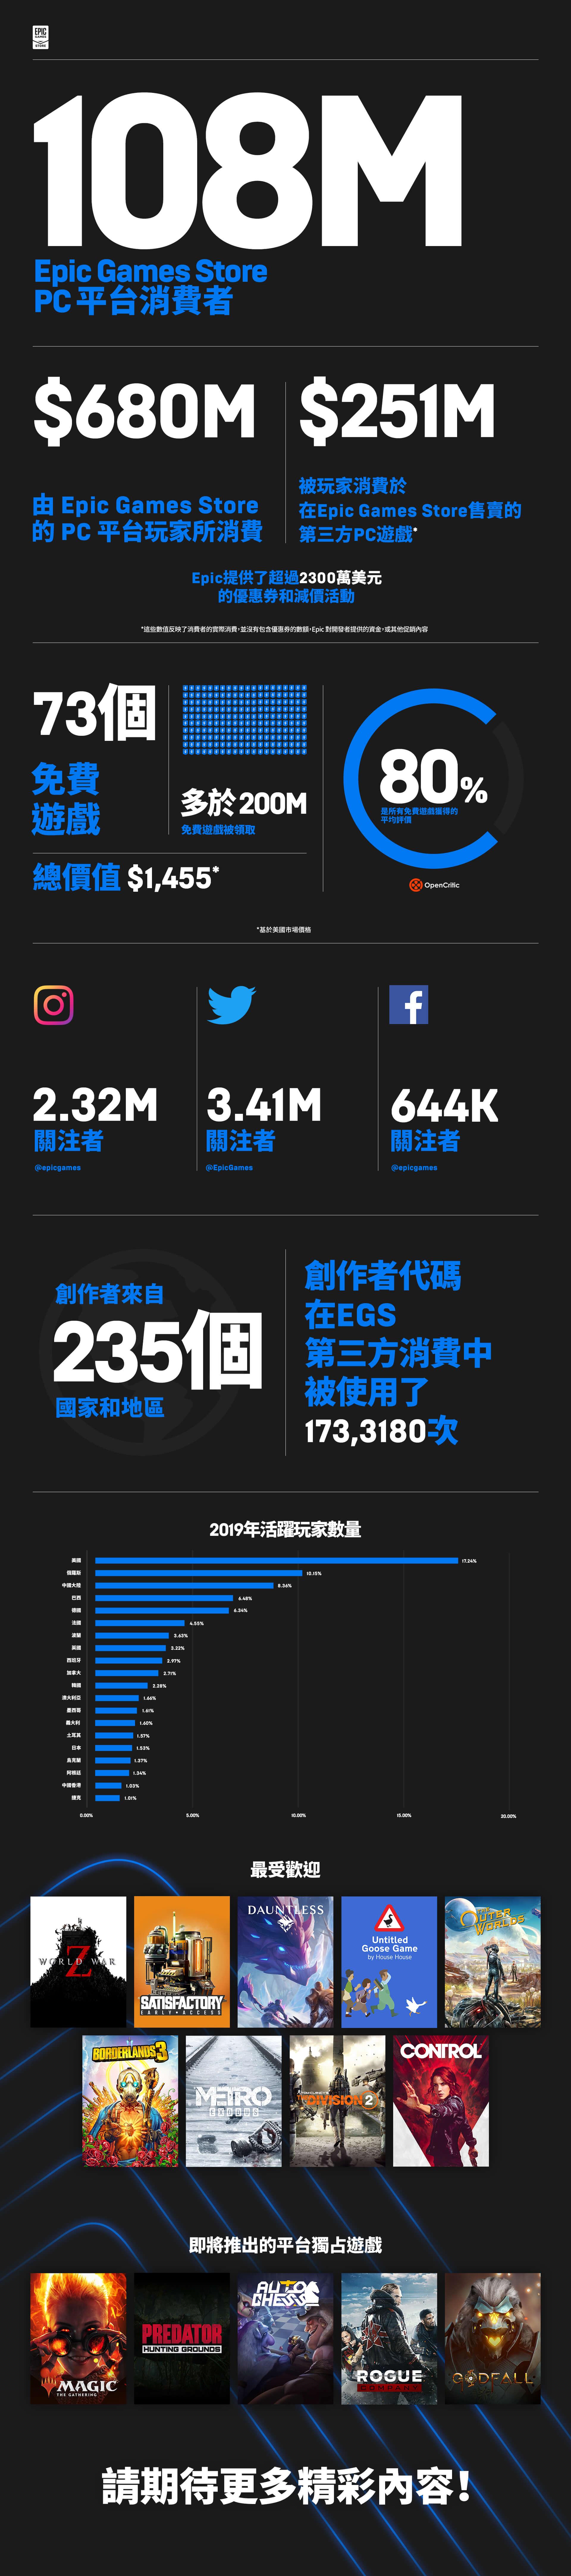 zhTW_EGS_Infographic.jpg